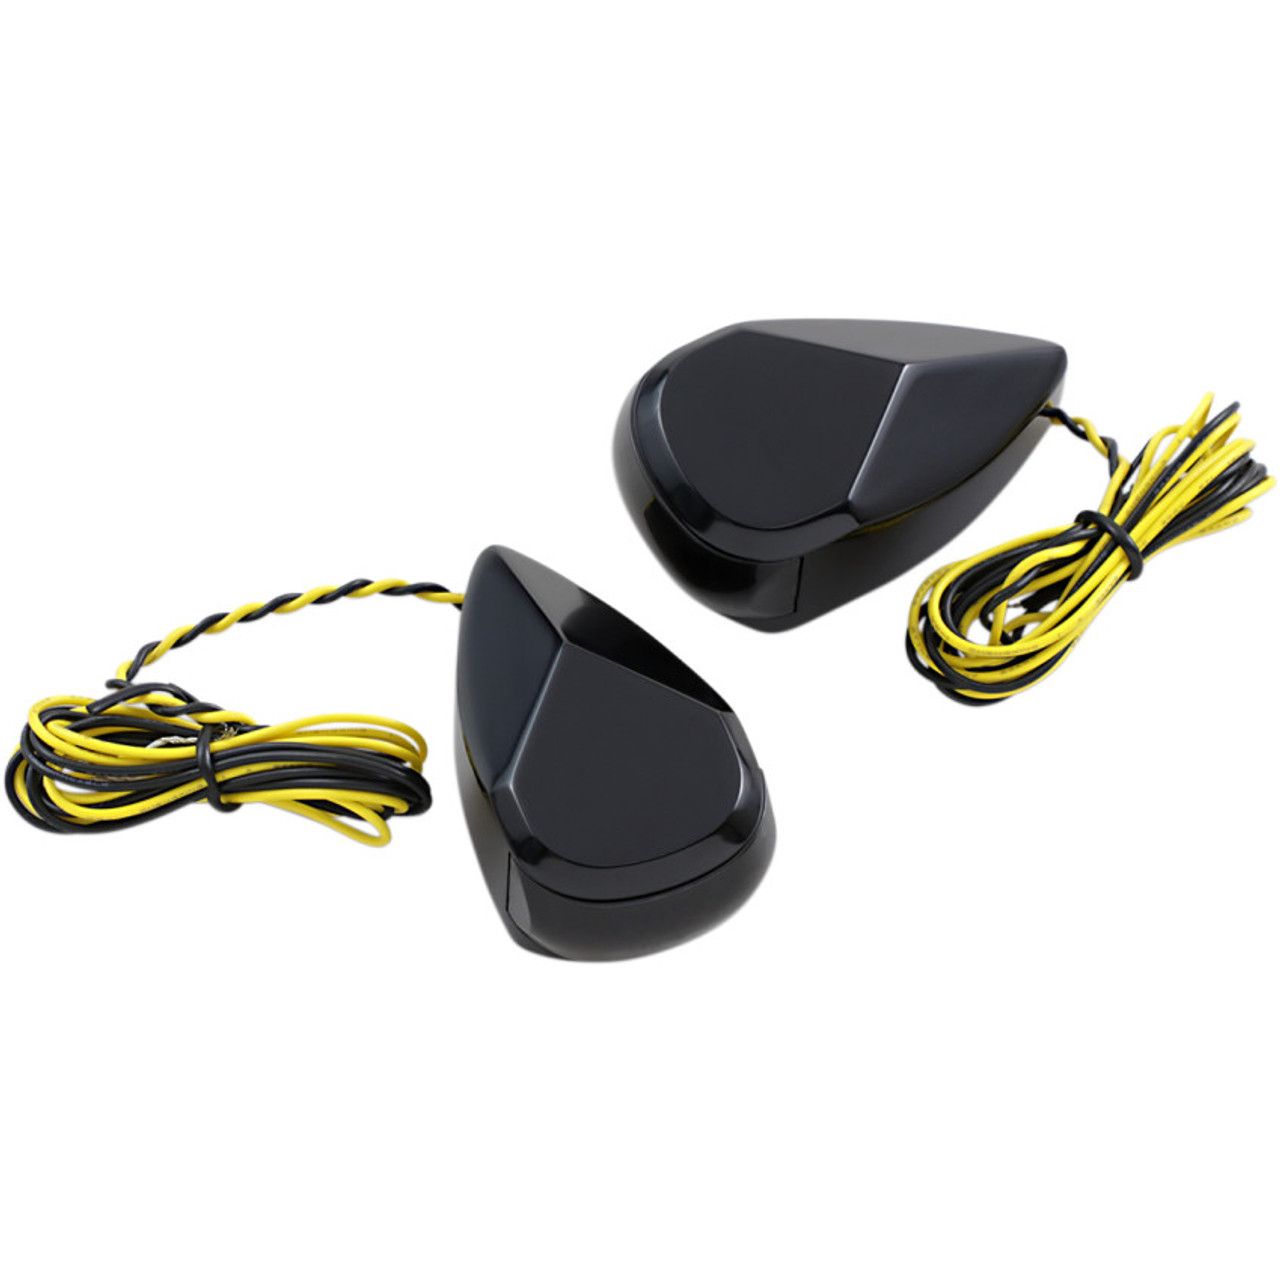 Alloy Art LED Turn Signal Lights for Harley Touring - Black